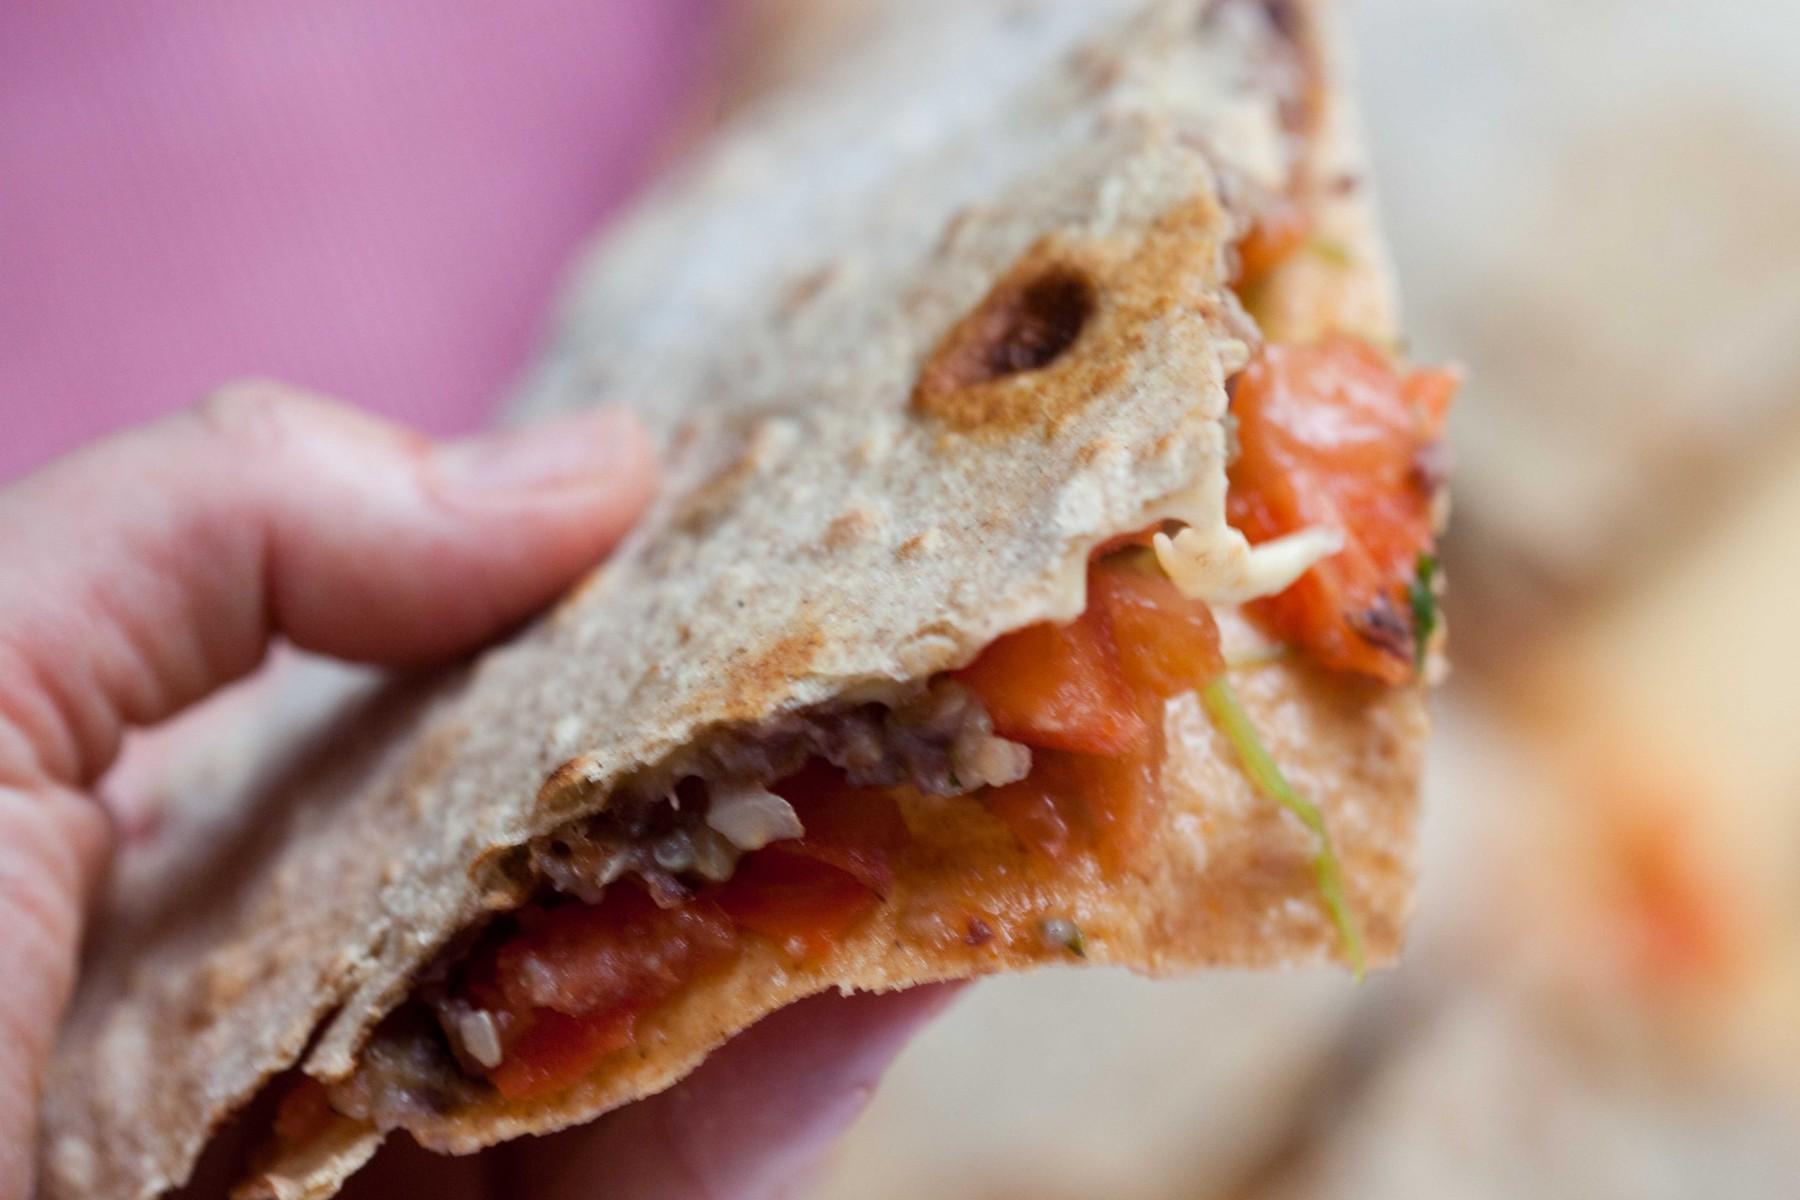 razowa-tortilla-kotlet-z-fasoli-adzuki